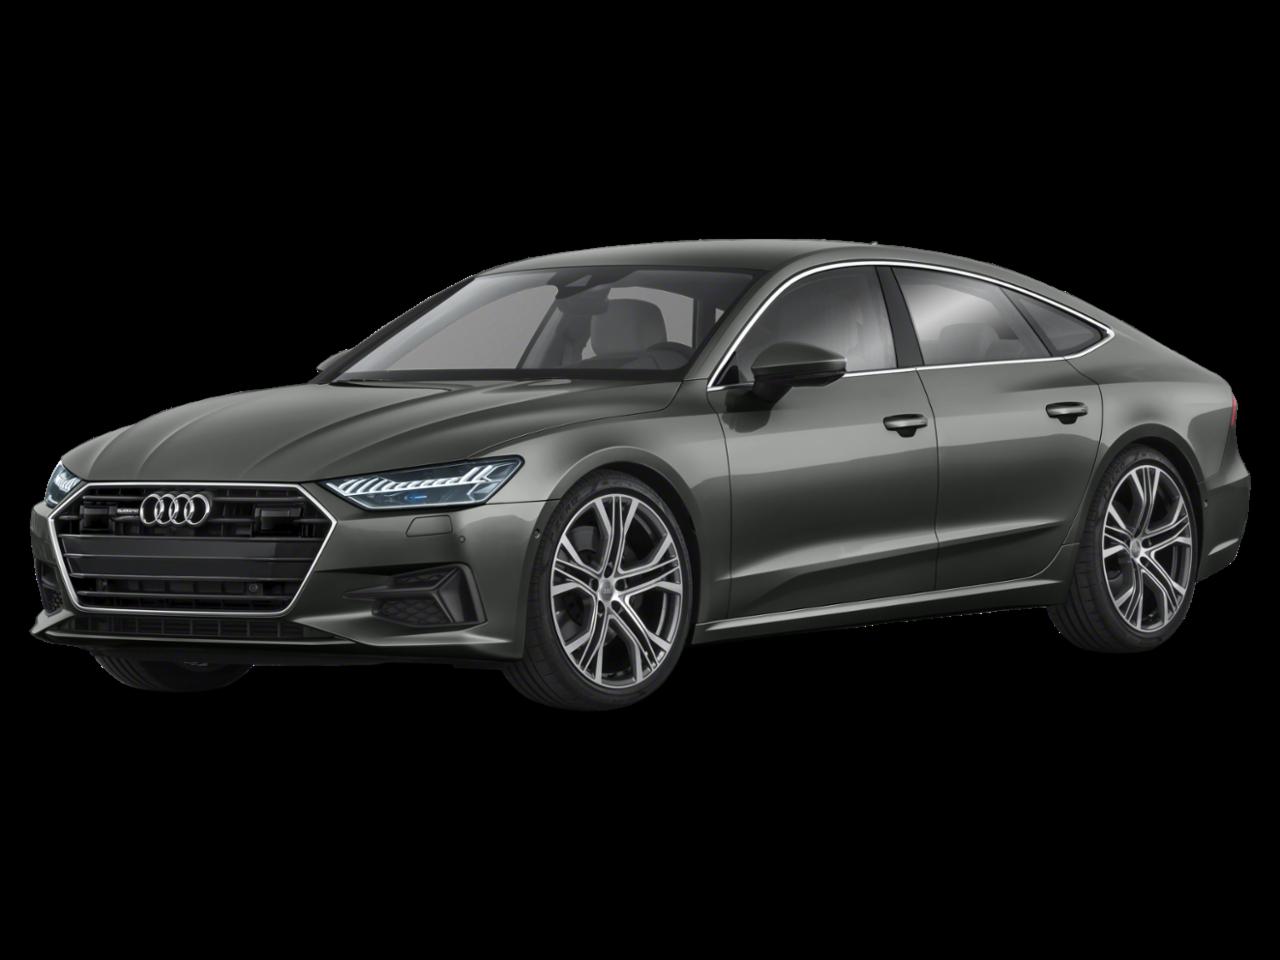 Audi 2022 A7 Prestige